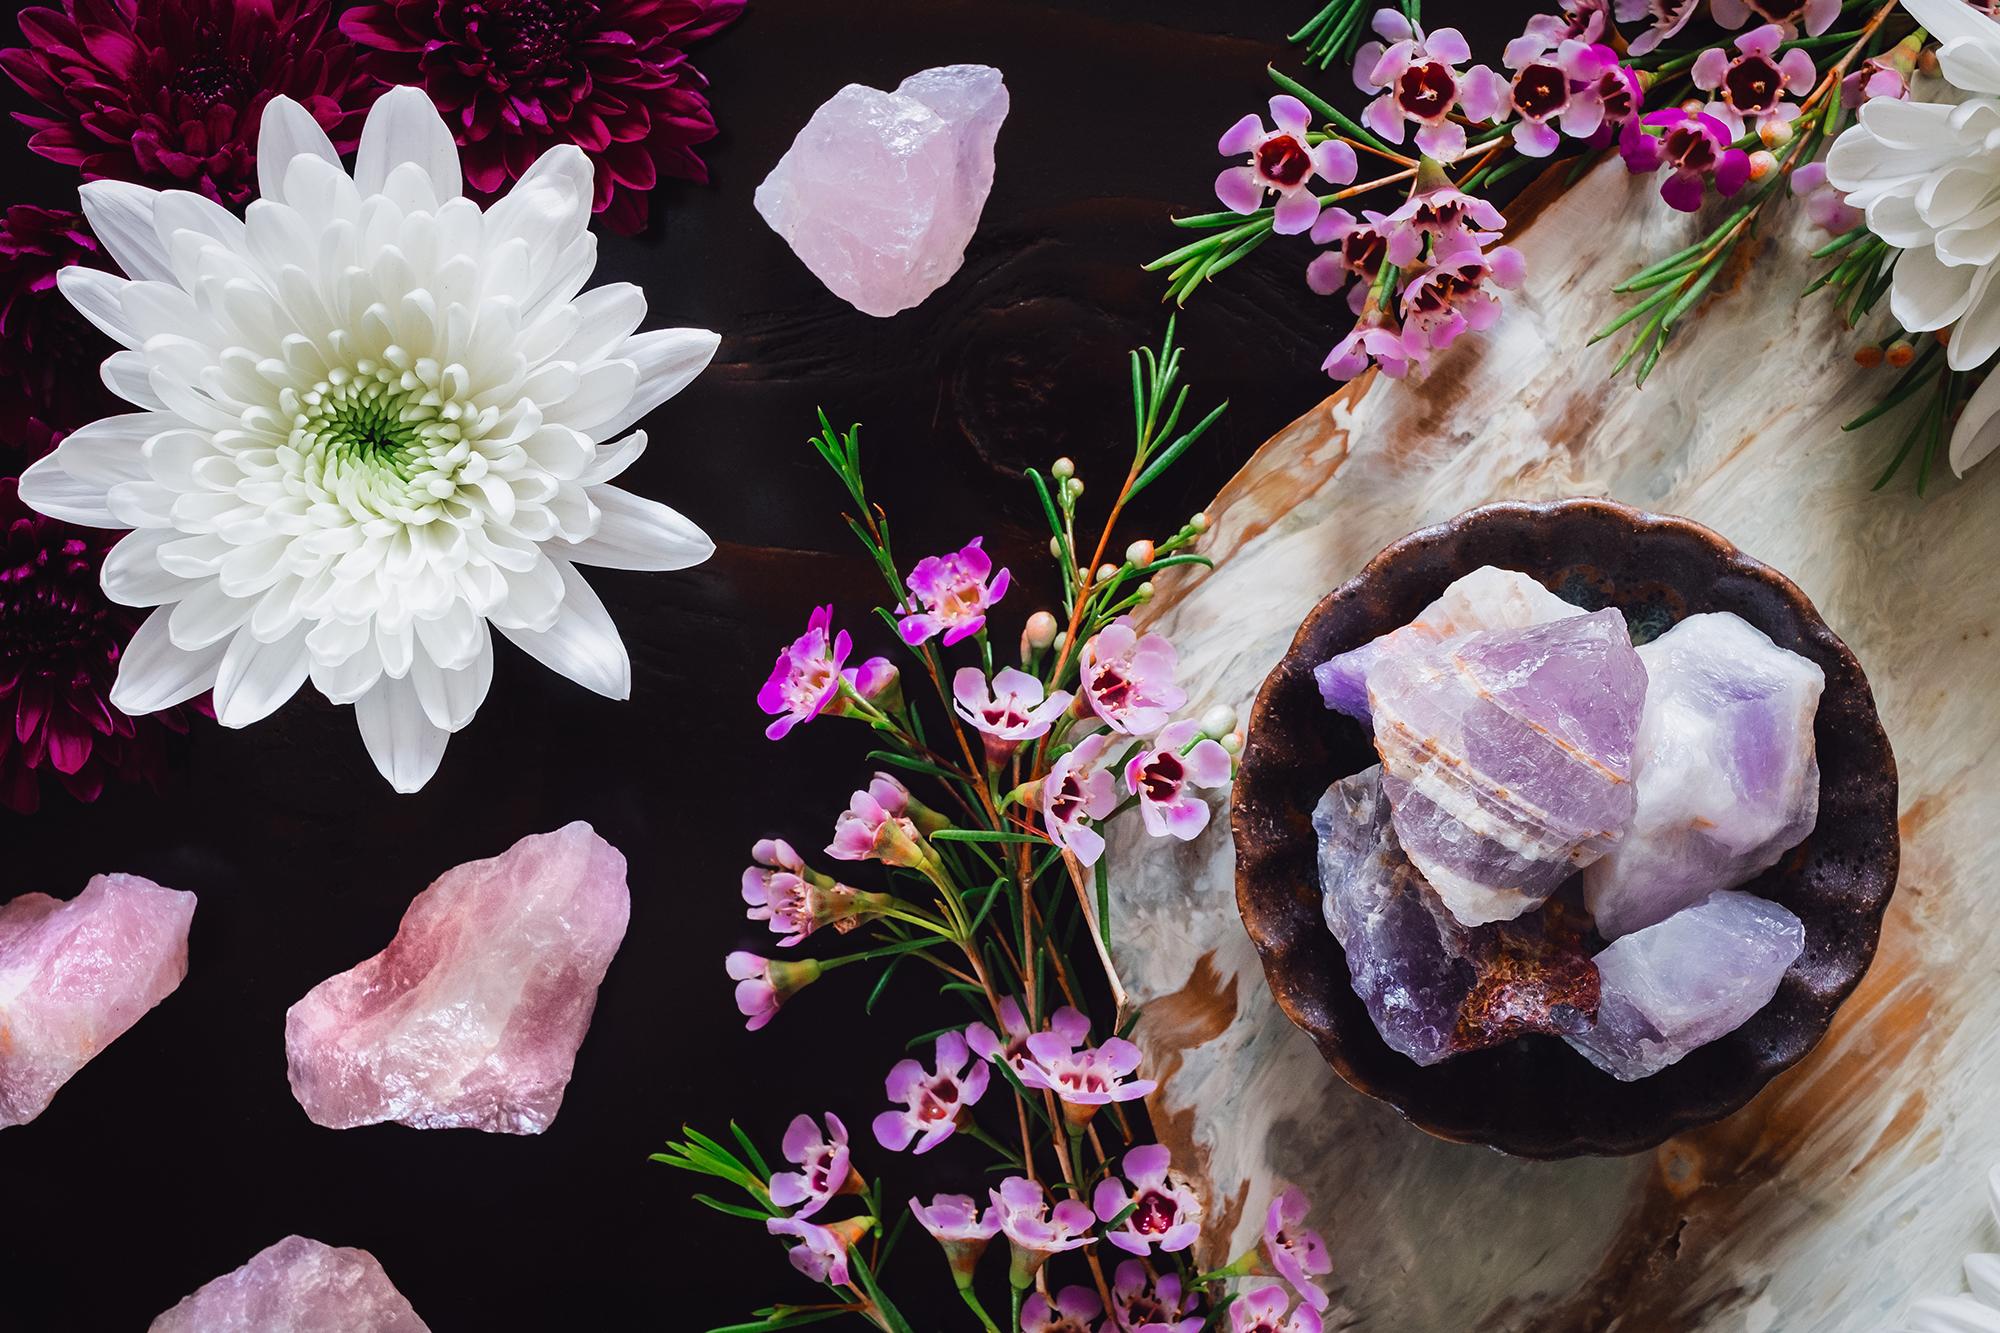 kristal therapie